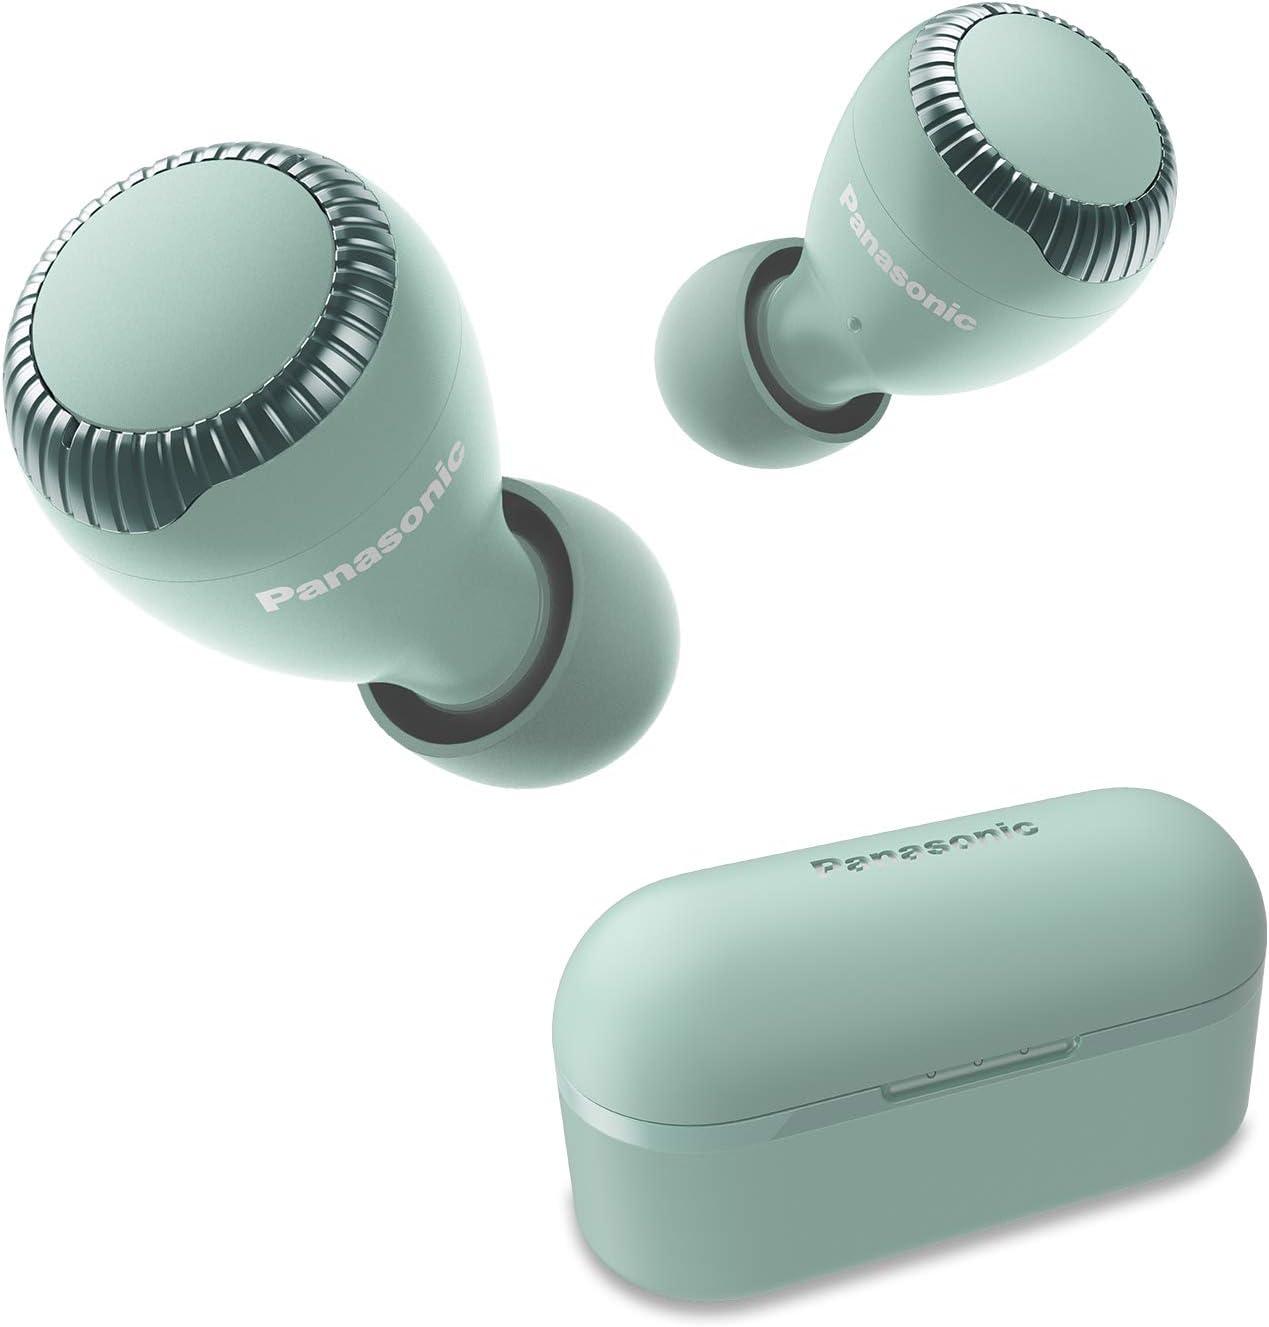 Panasonic True Wireless Earbuds | Bluetooth Earbuds|IPX4 Water Resistant | Small, Lightweight | Long Battery Life, Alexa Compatible | RZ-S300W (Green)